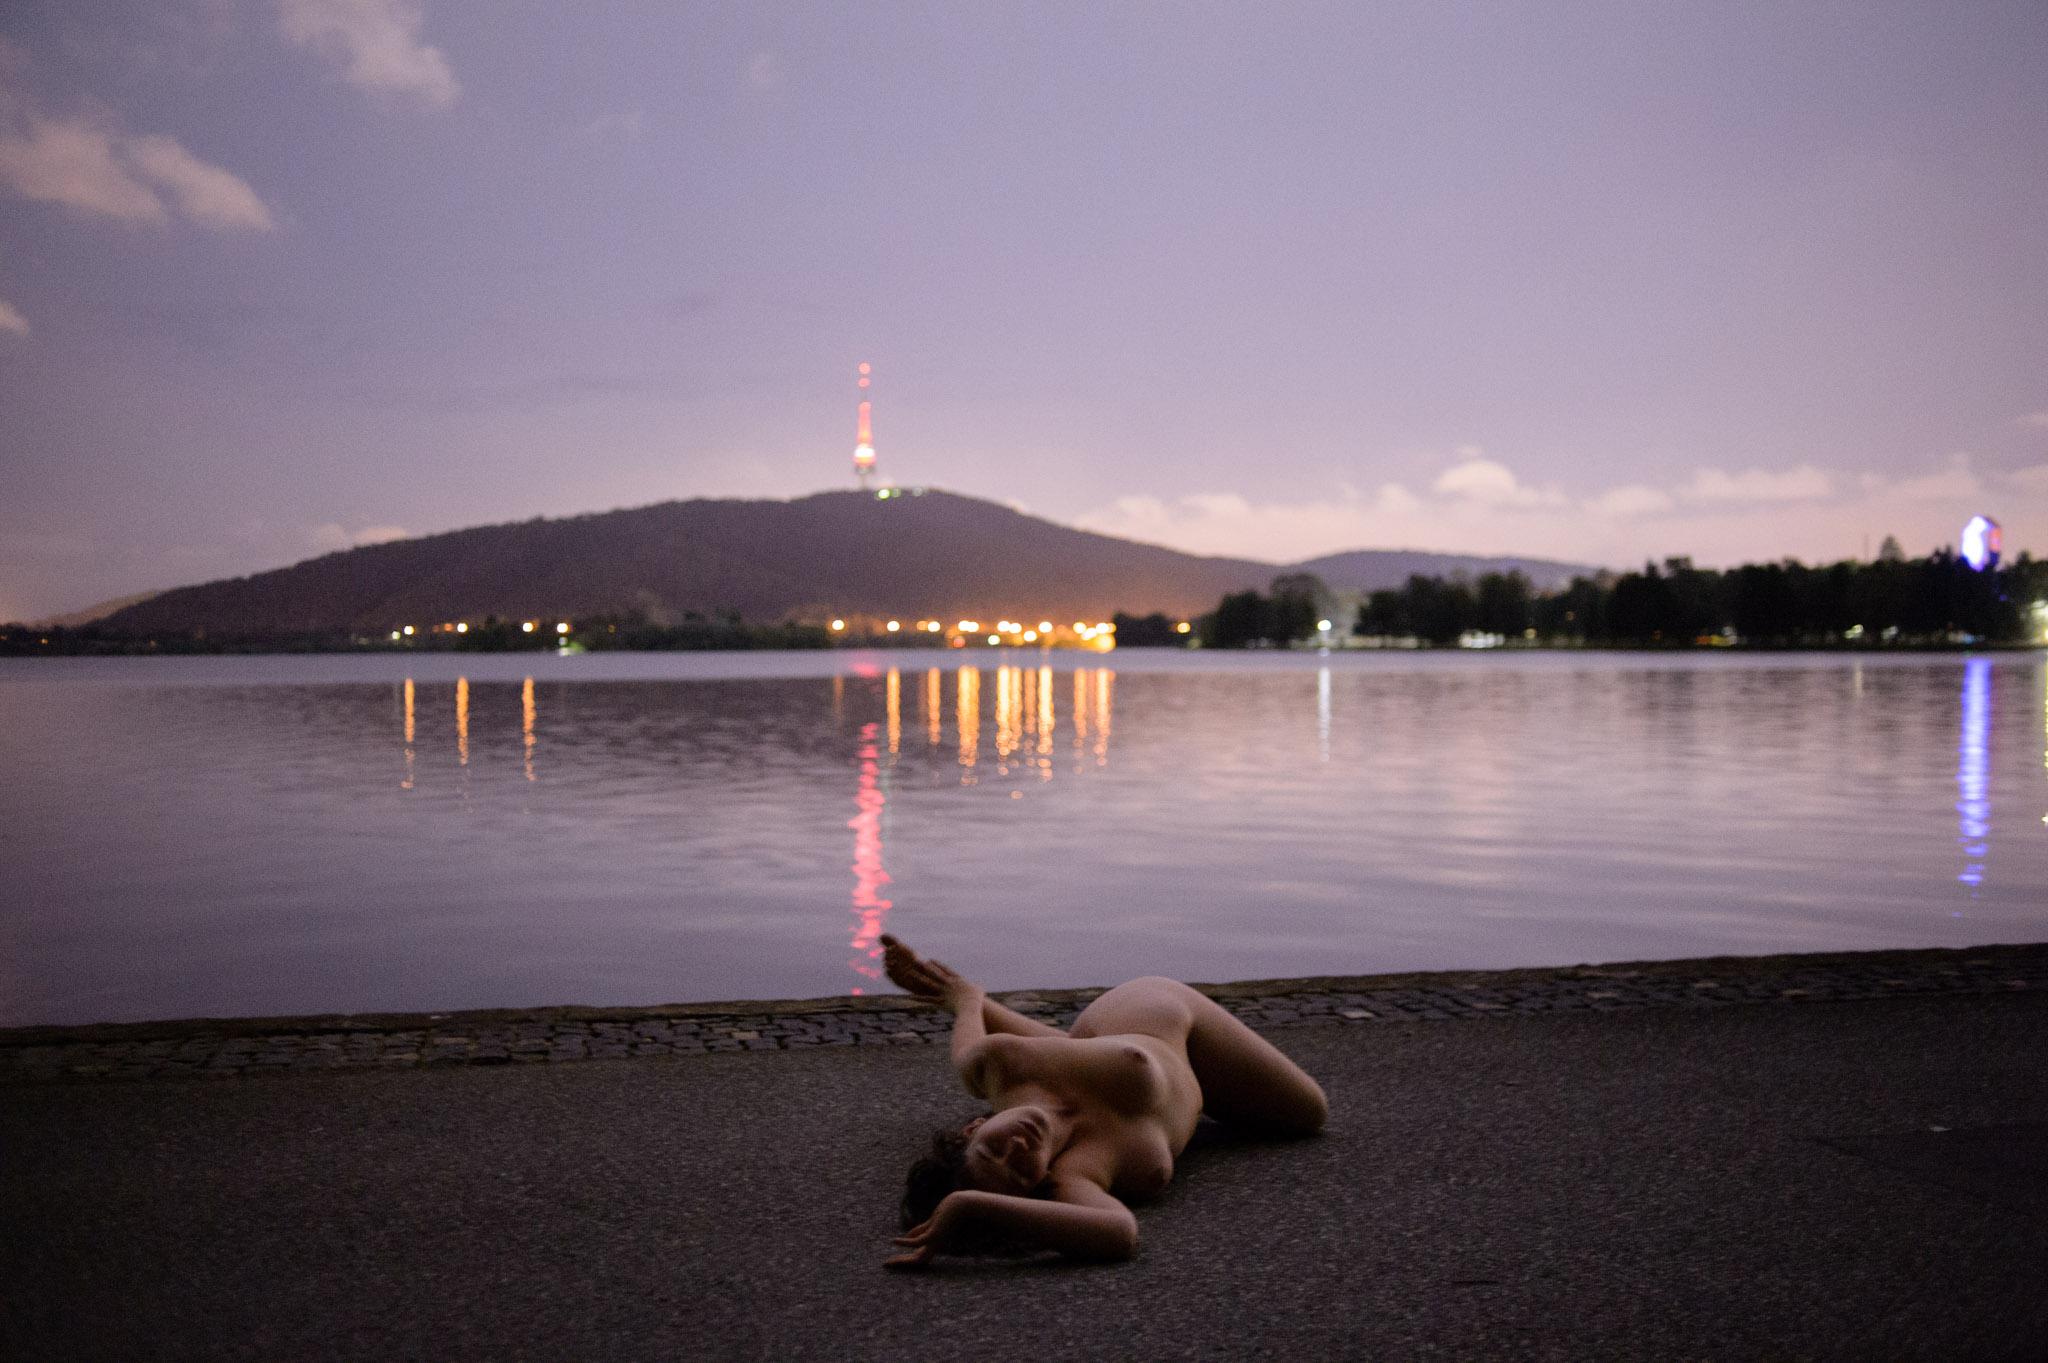 Anna Maria - night location (NSFW) - D-eye Photography - Blog